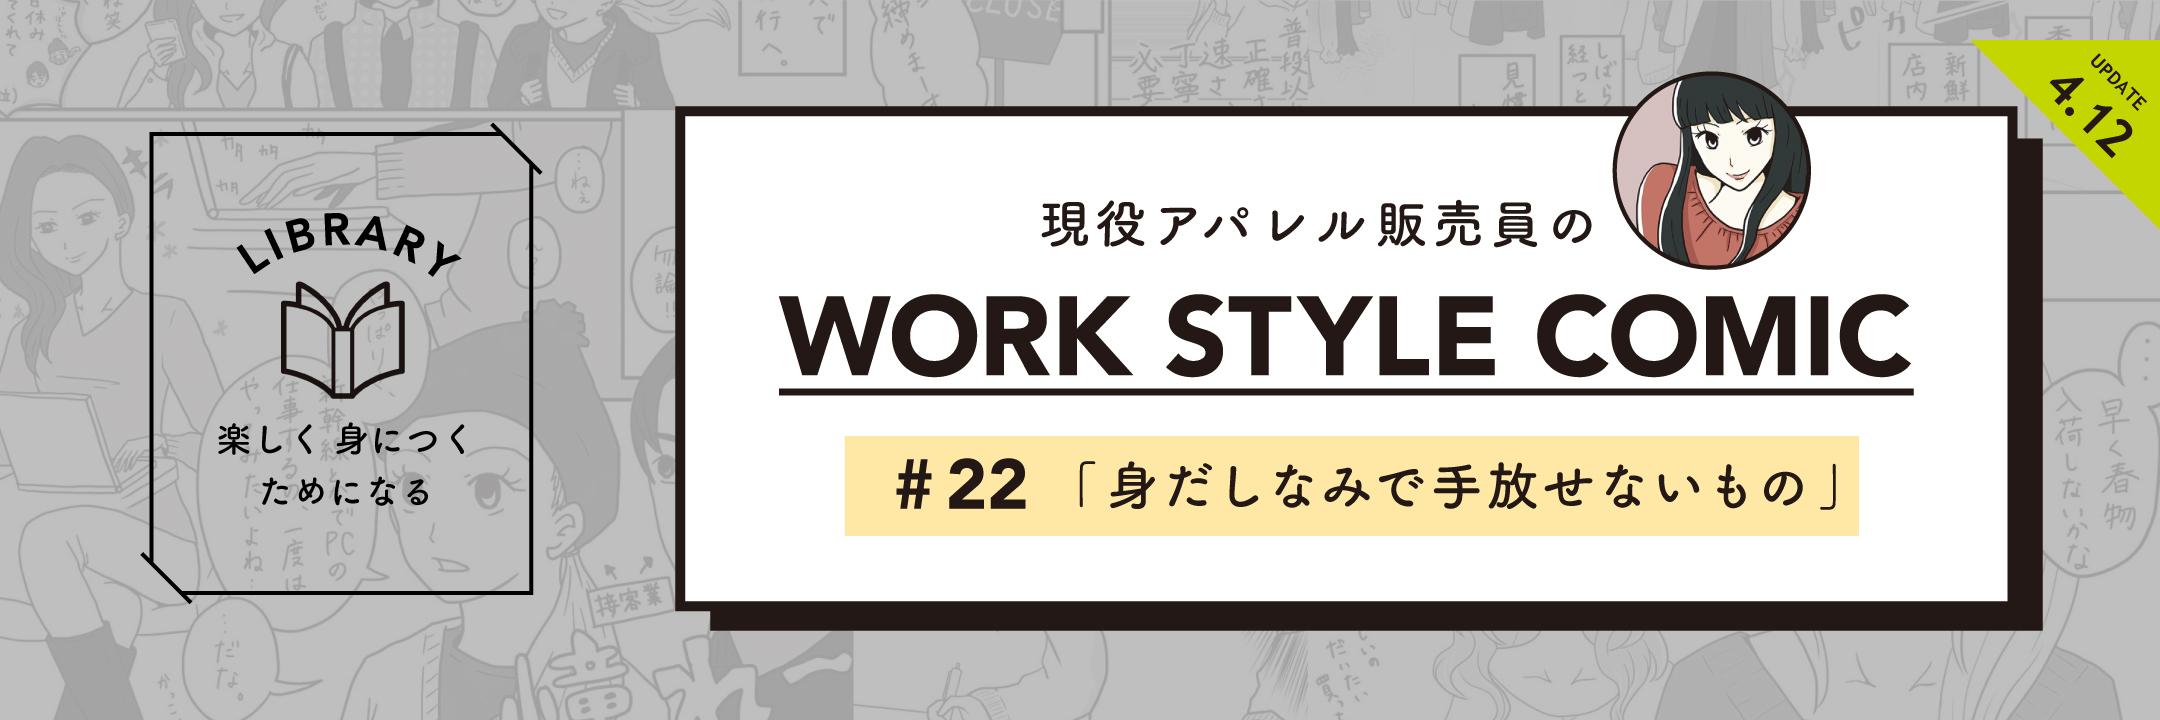 WORK STYLE COMIC22